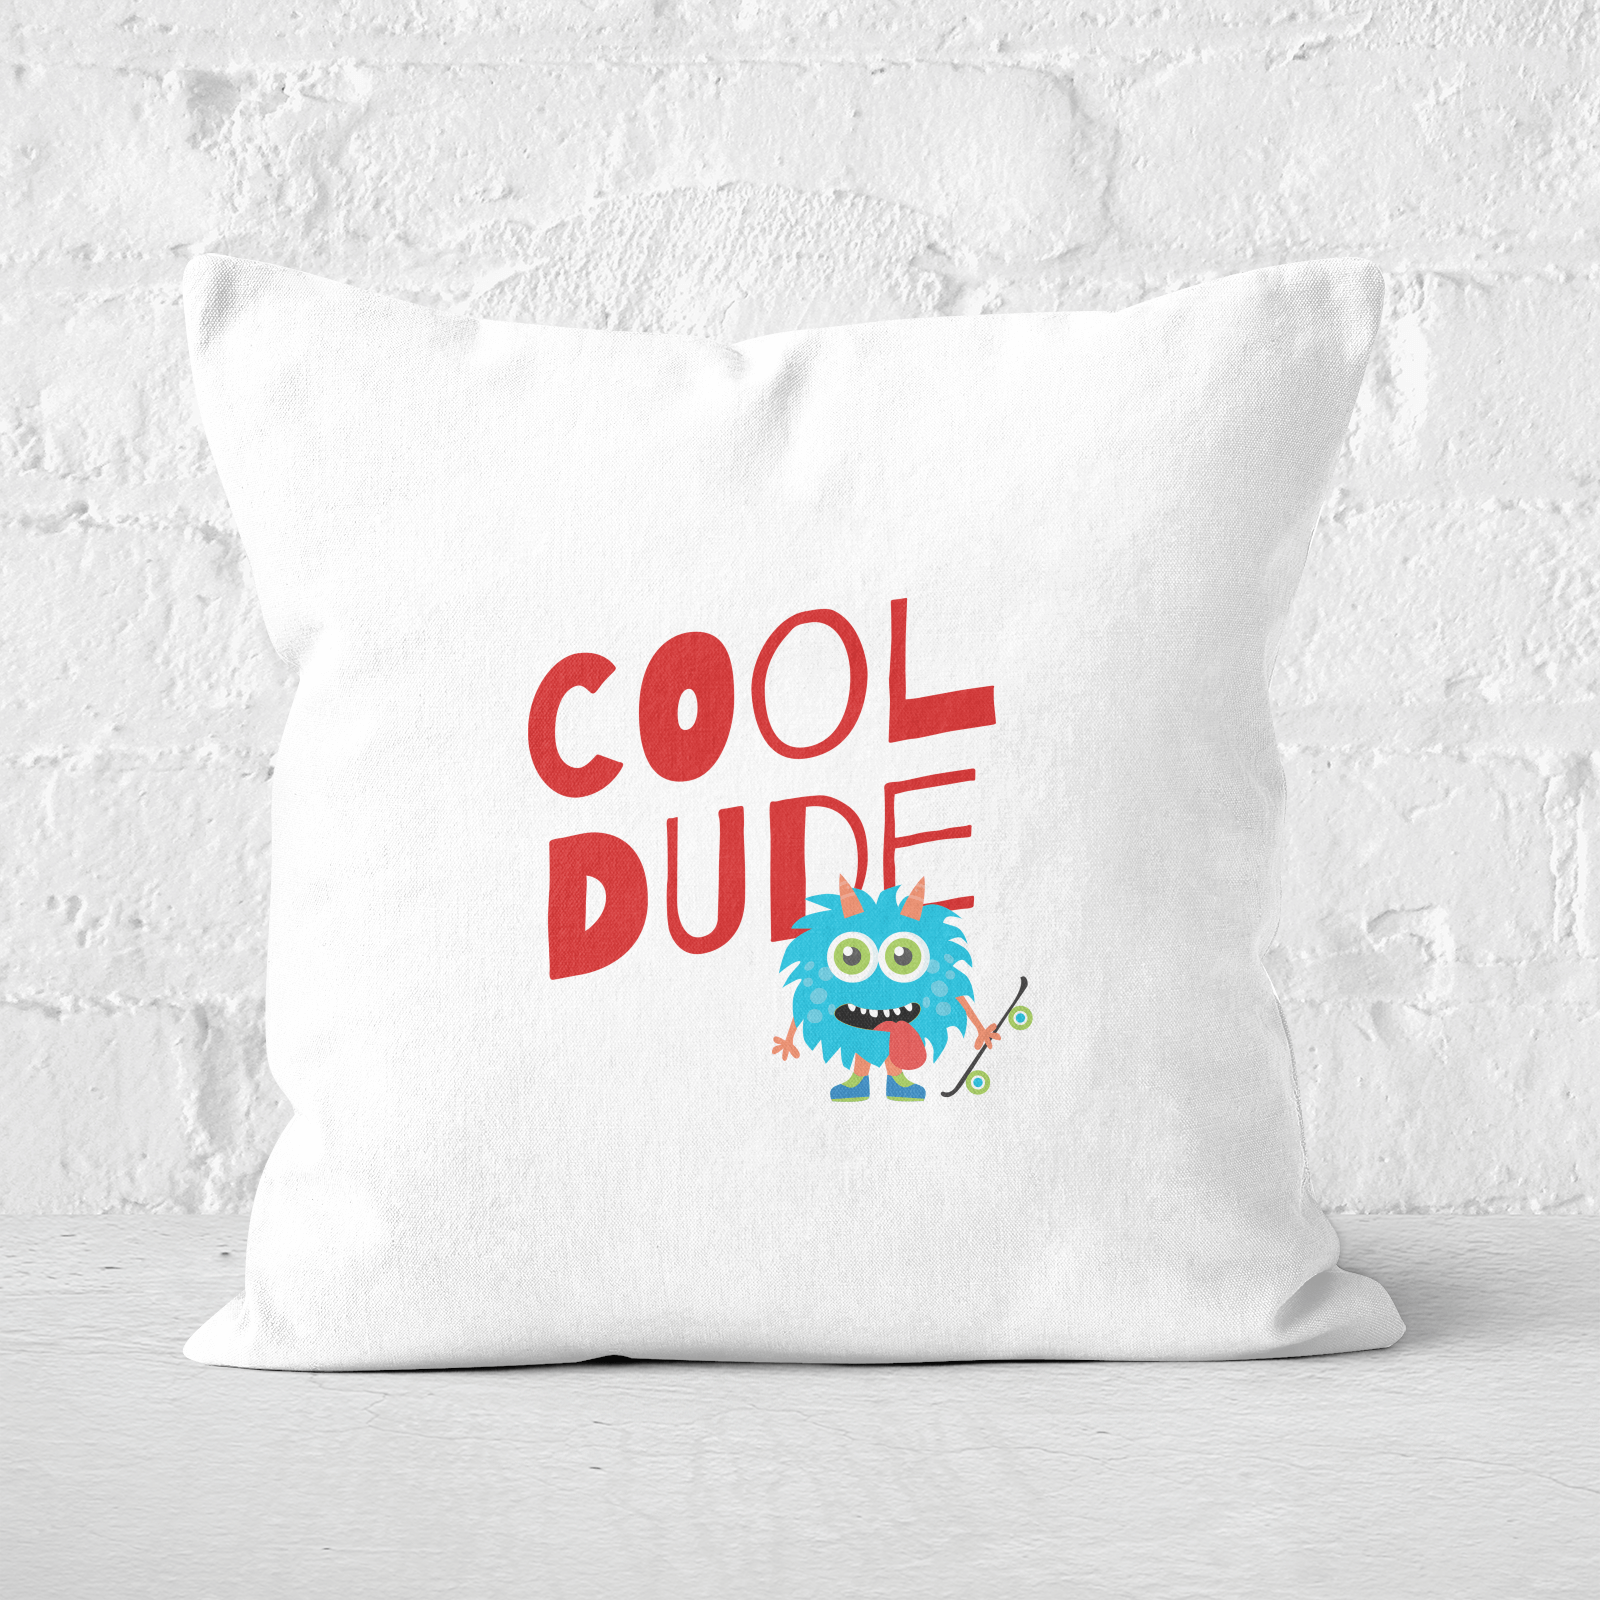 Cool Dude Skateboard Square Cushion   60x60cm   Soft Touch